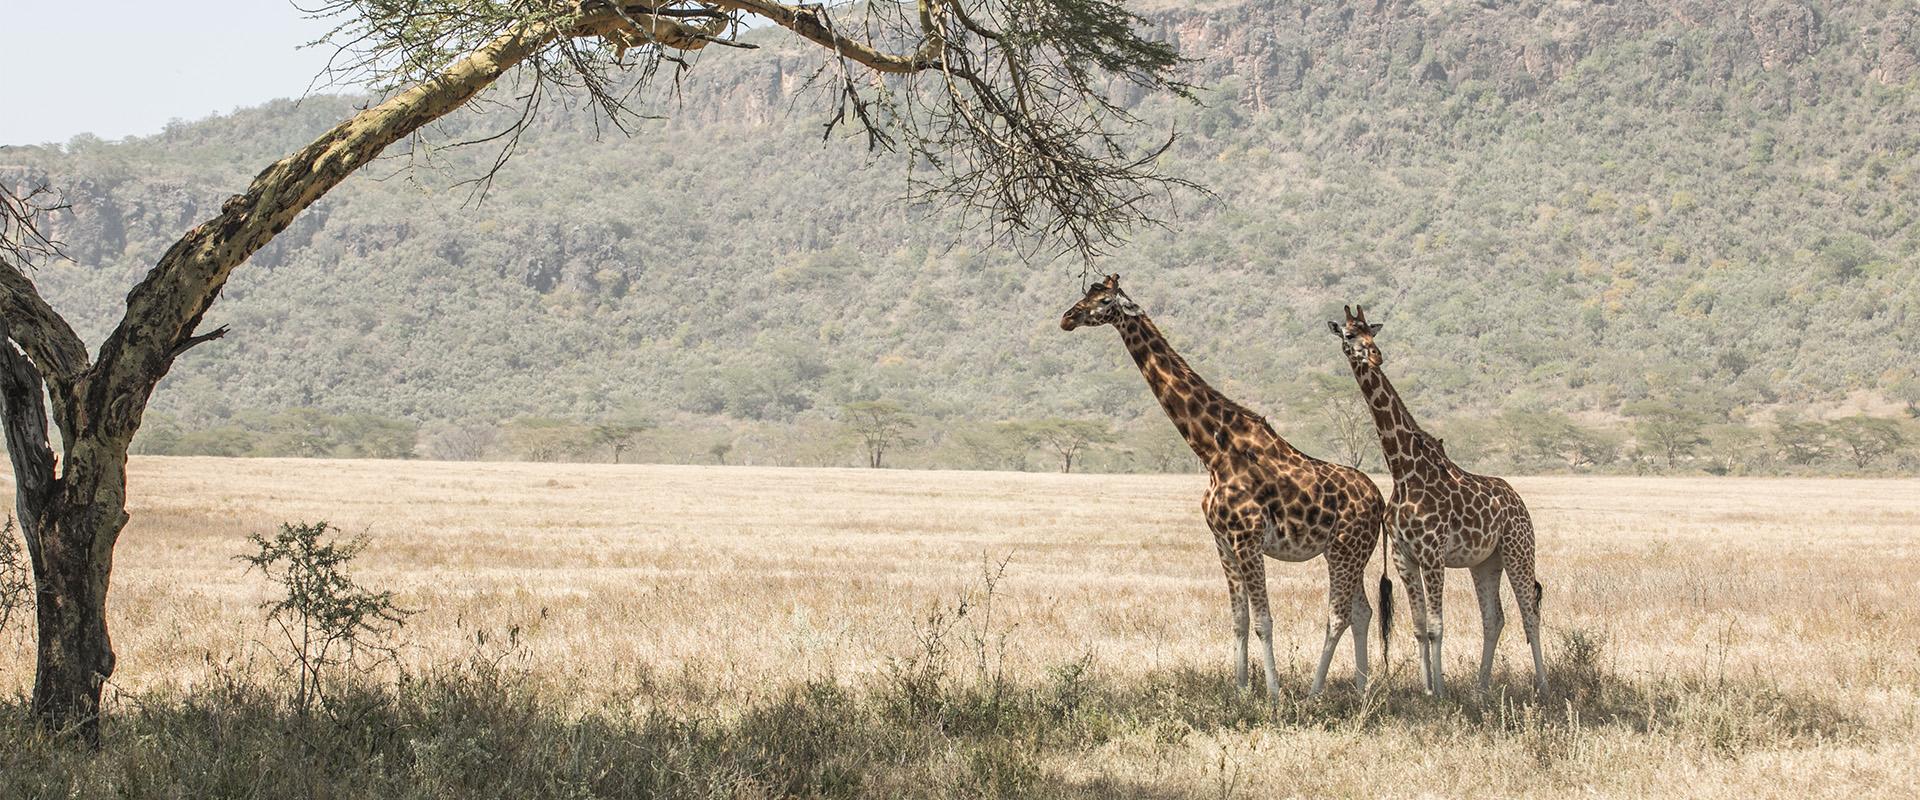 giraffe albero nakuru Kenya Mani Tese 2018